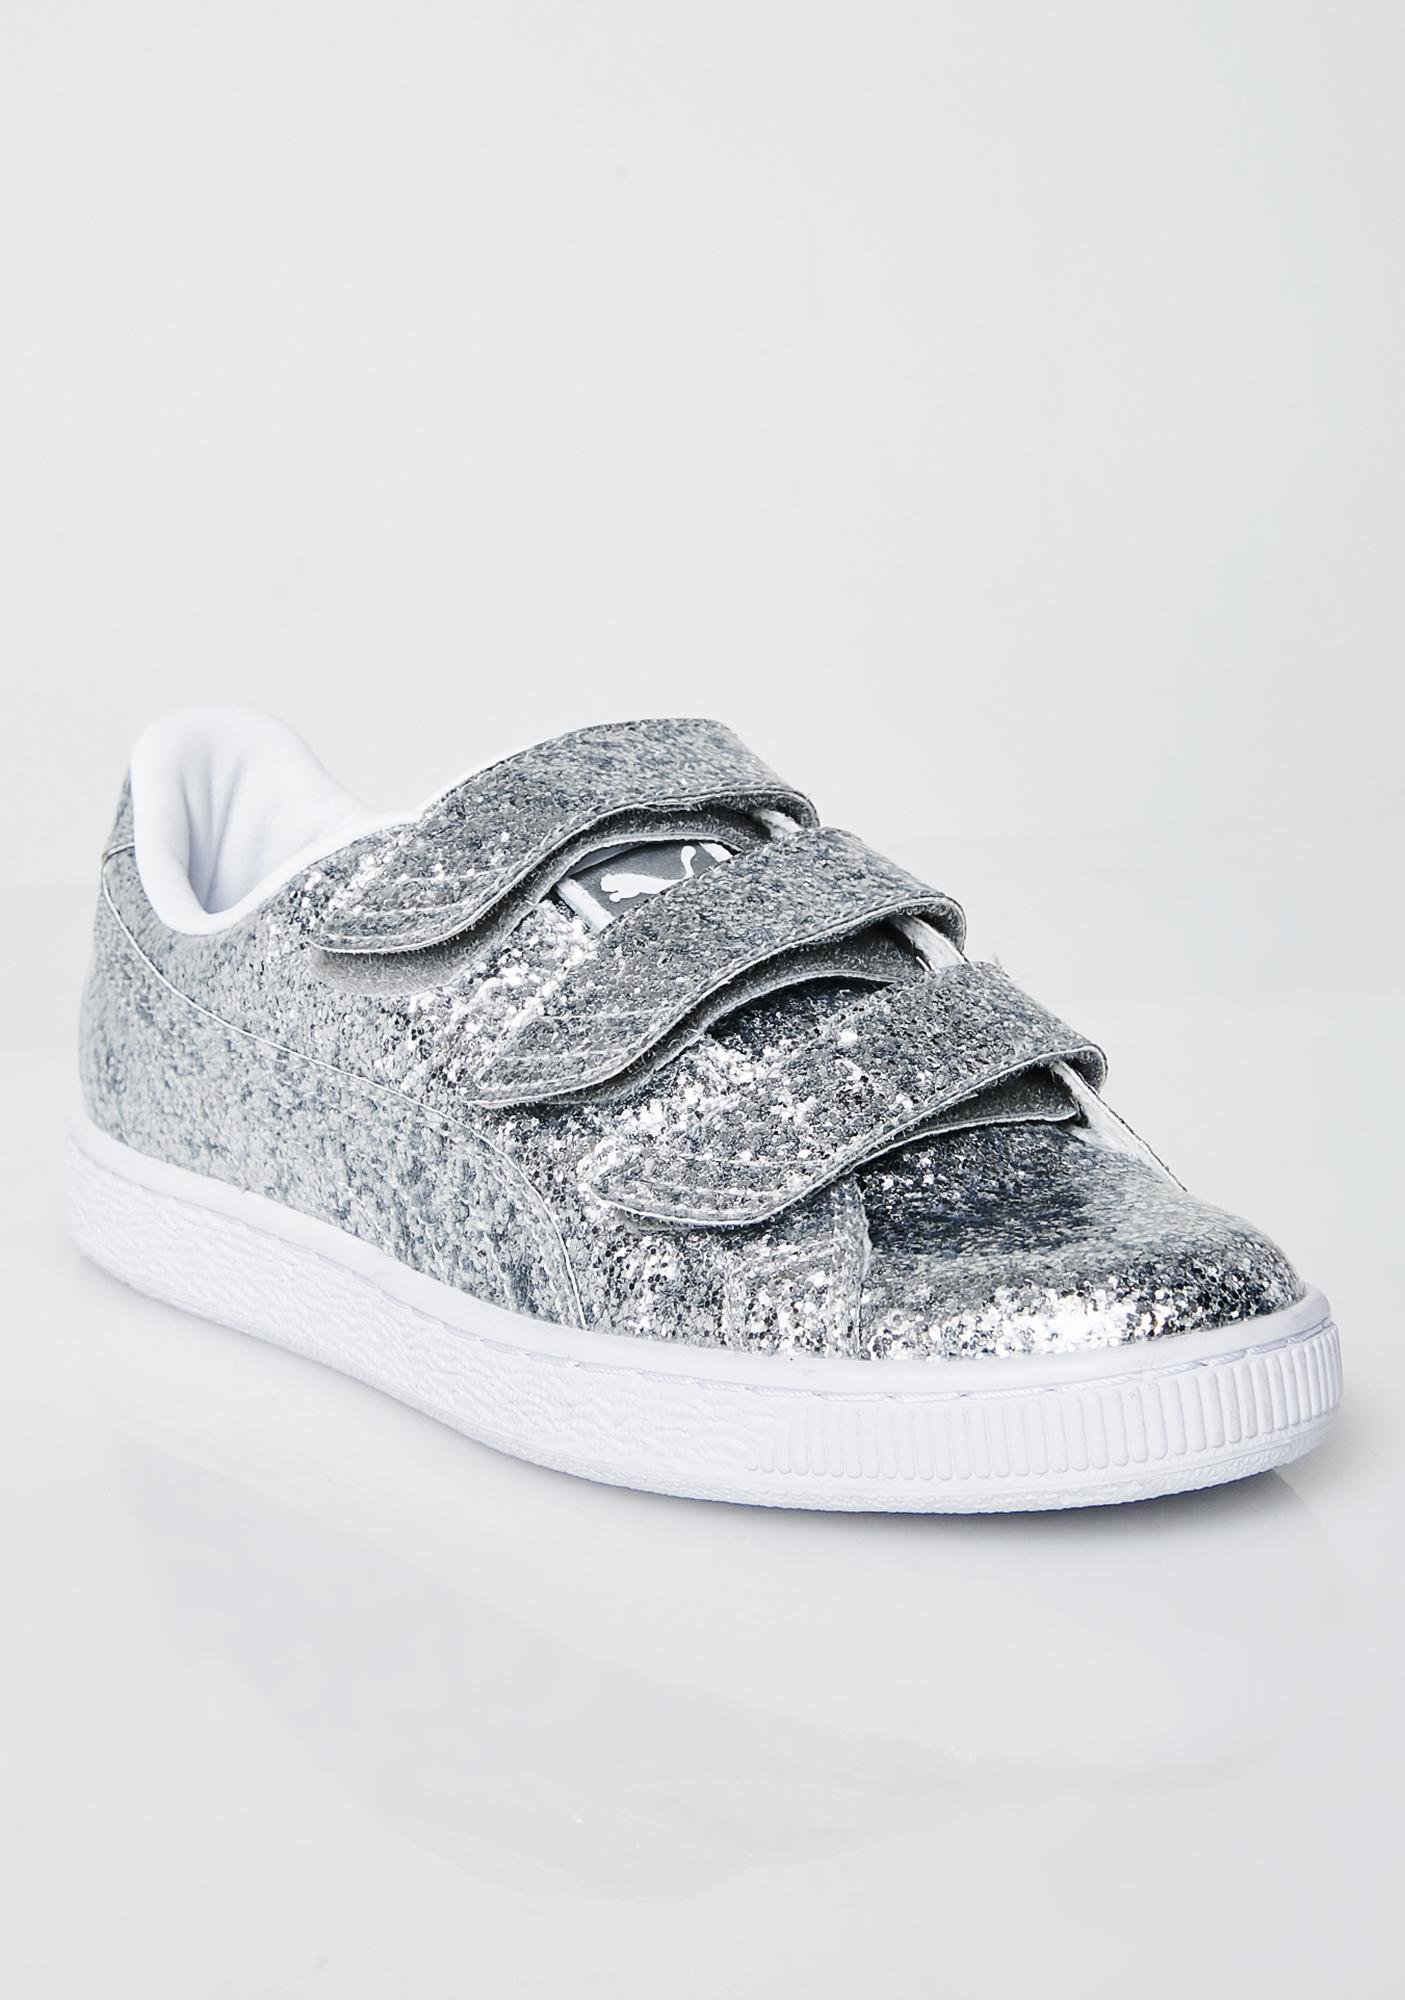 cd74d0983cd ... PUMA Basket Strap Glitter Sneakers